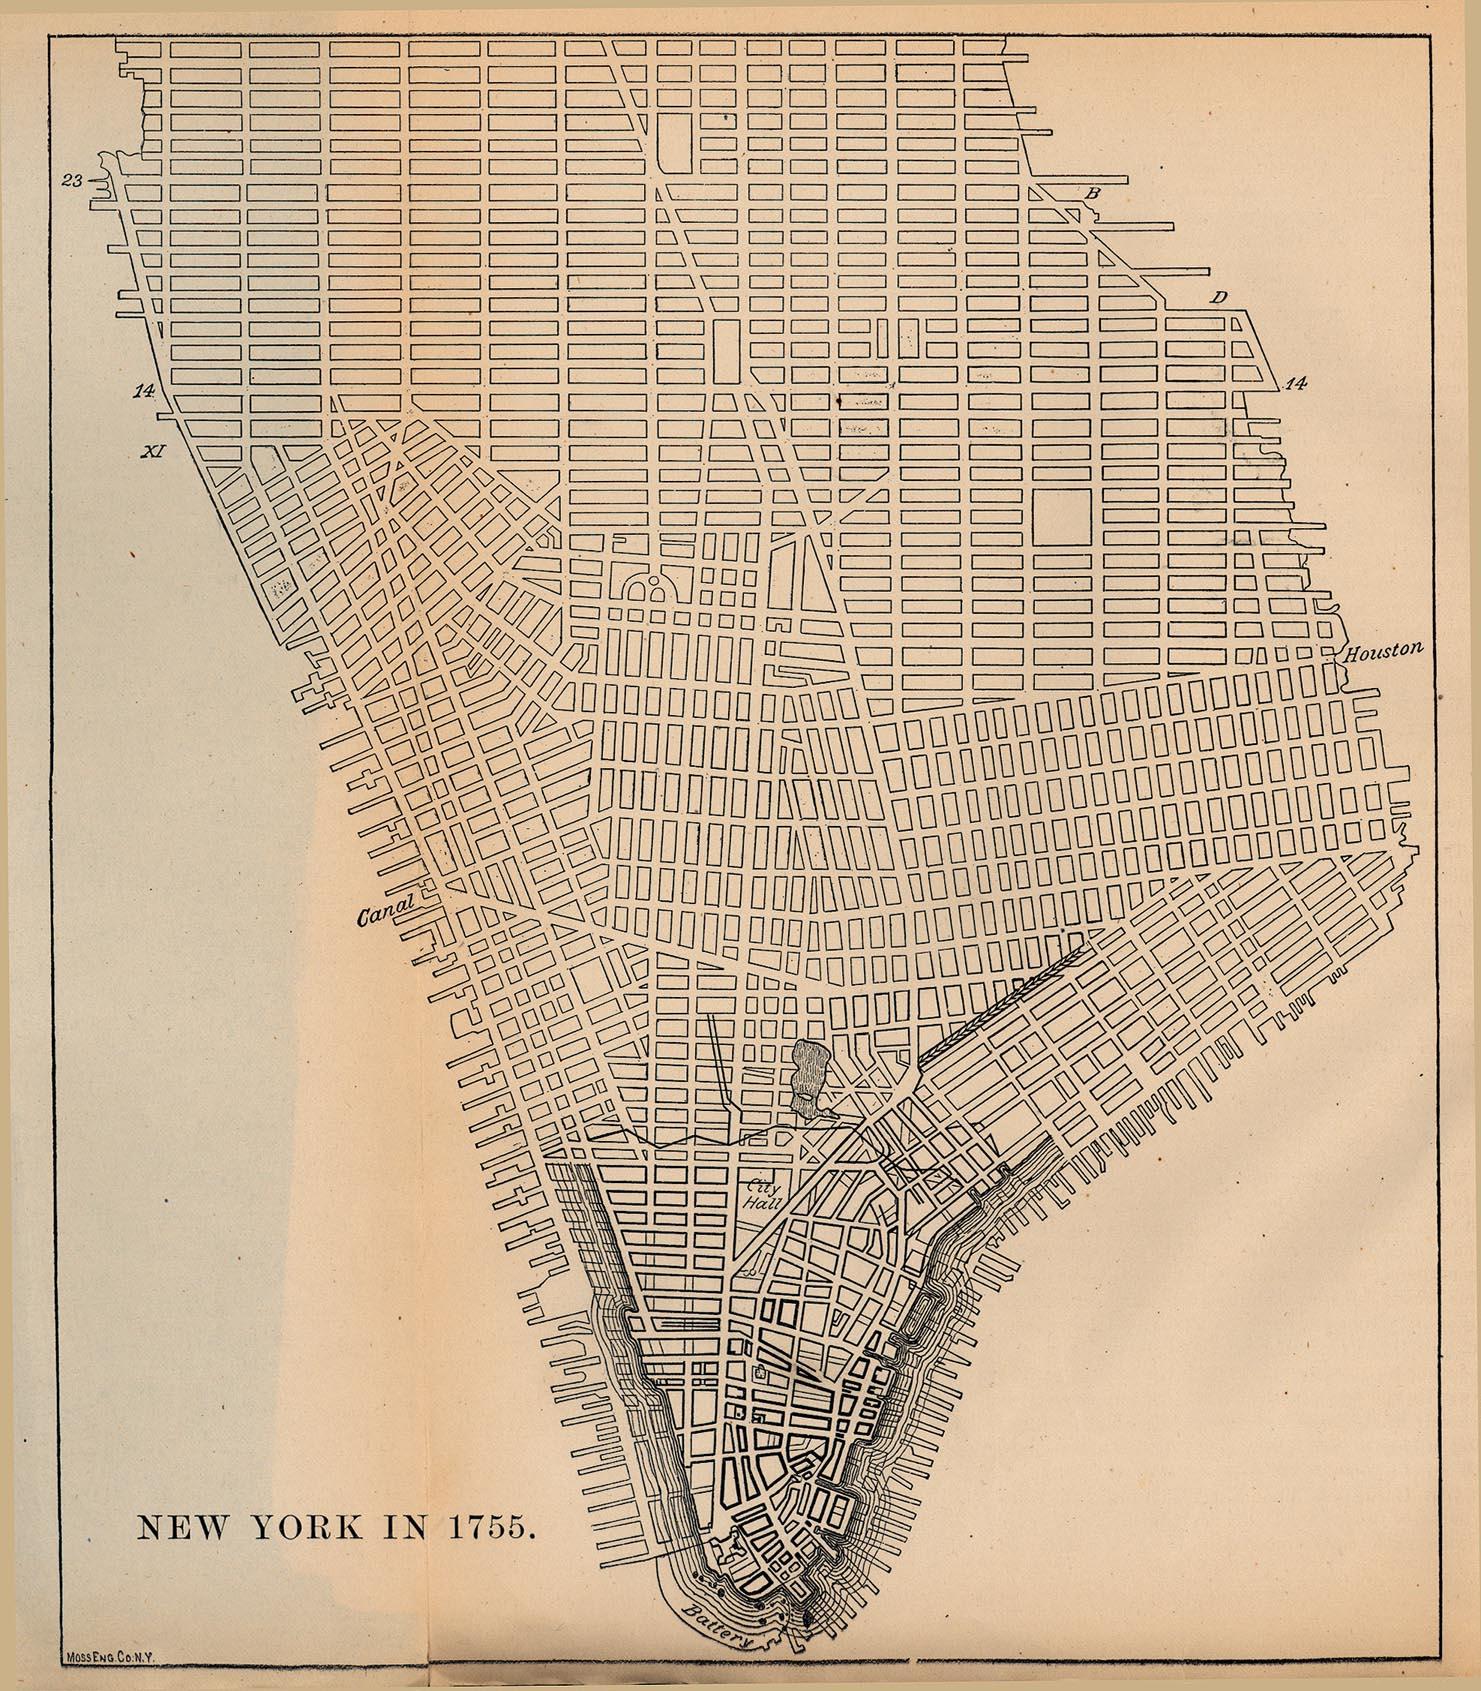 New York City Map, New York, United States 1755